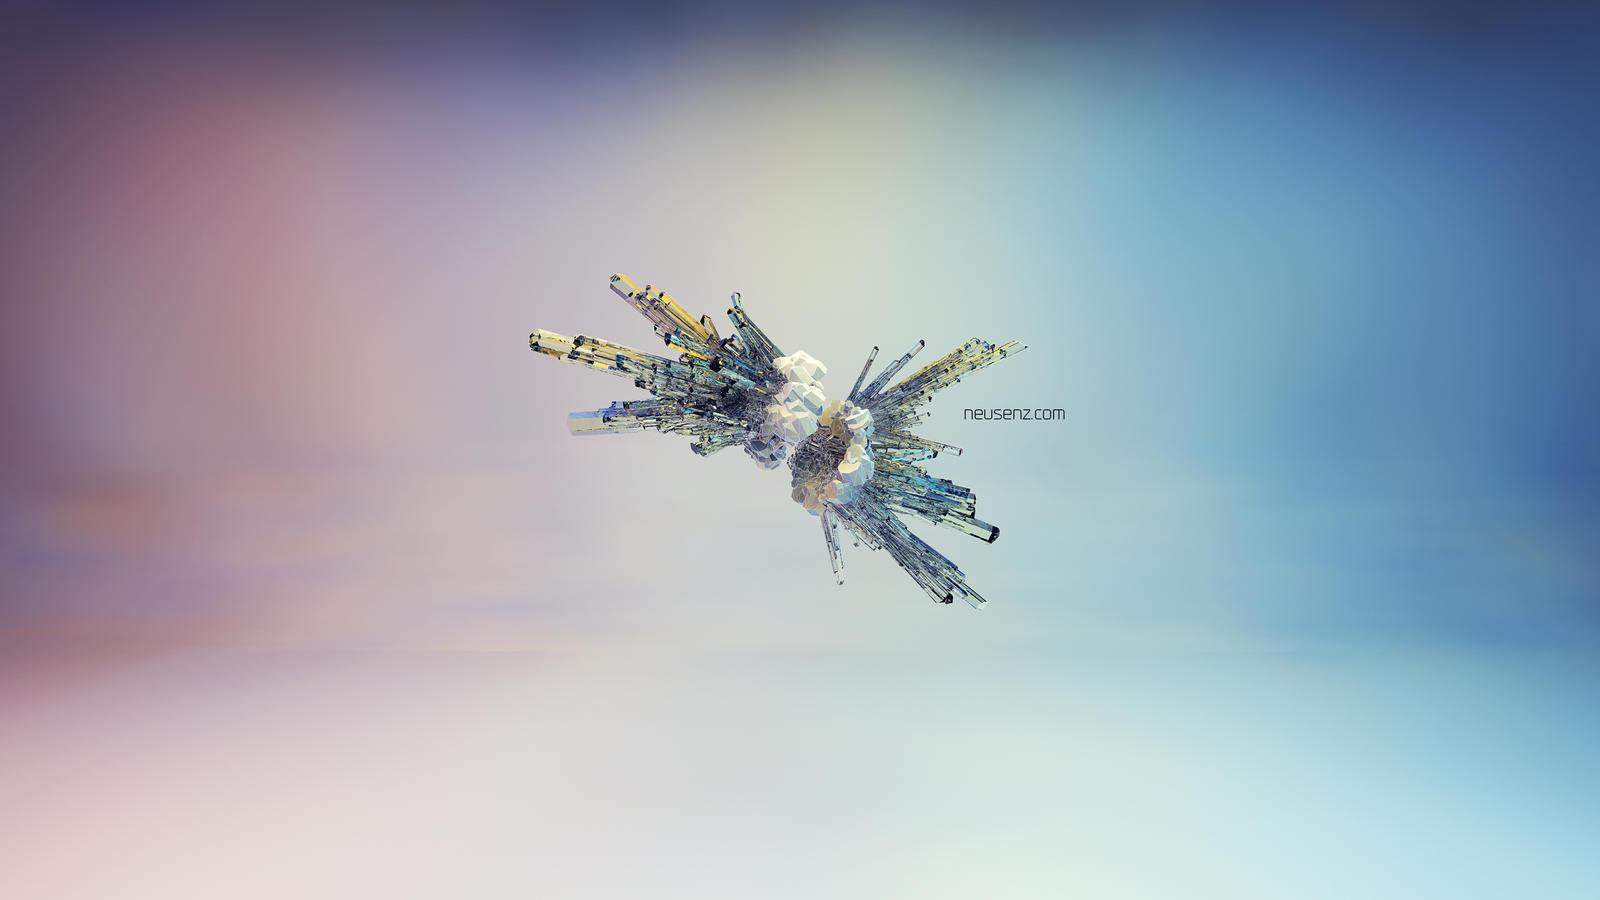 Crystal Collision by neutrix